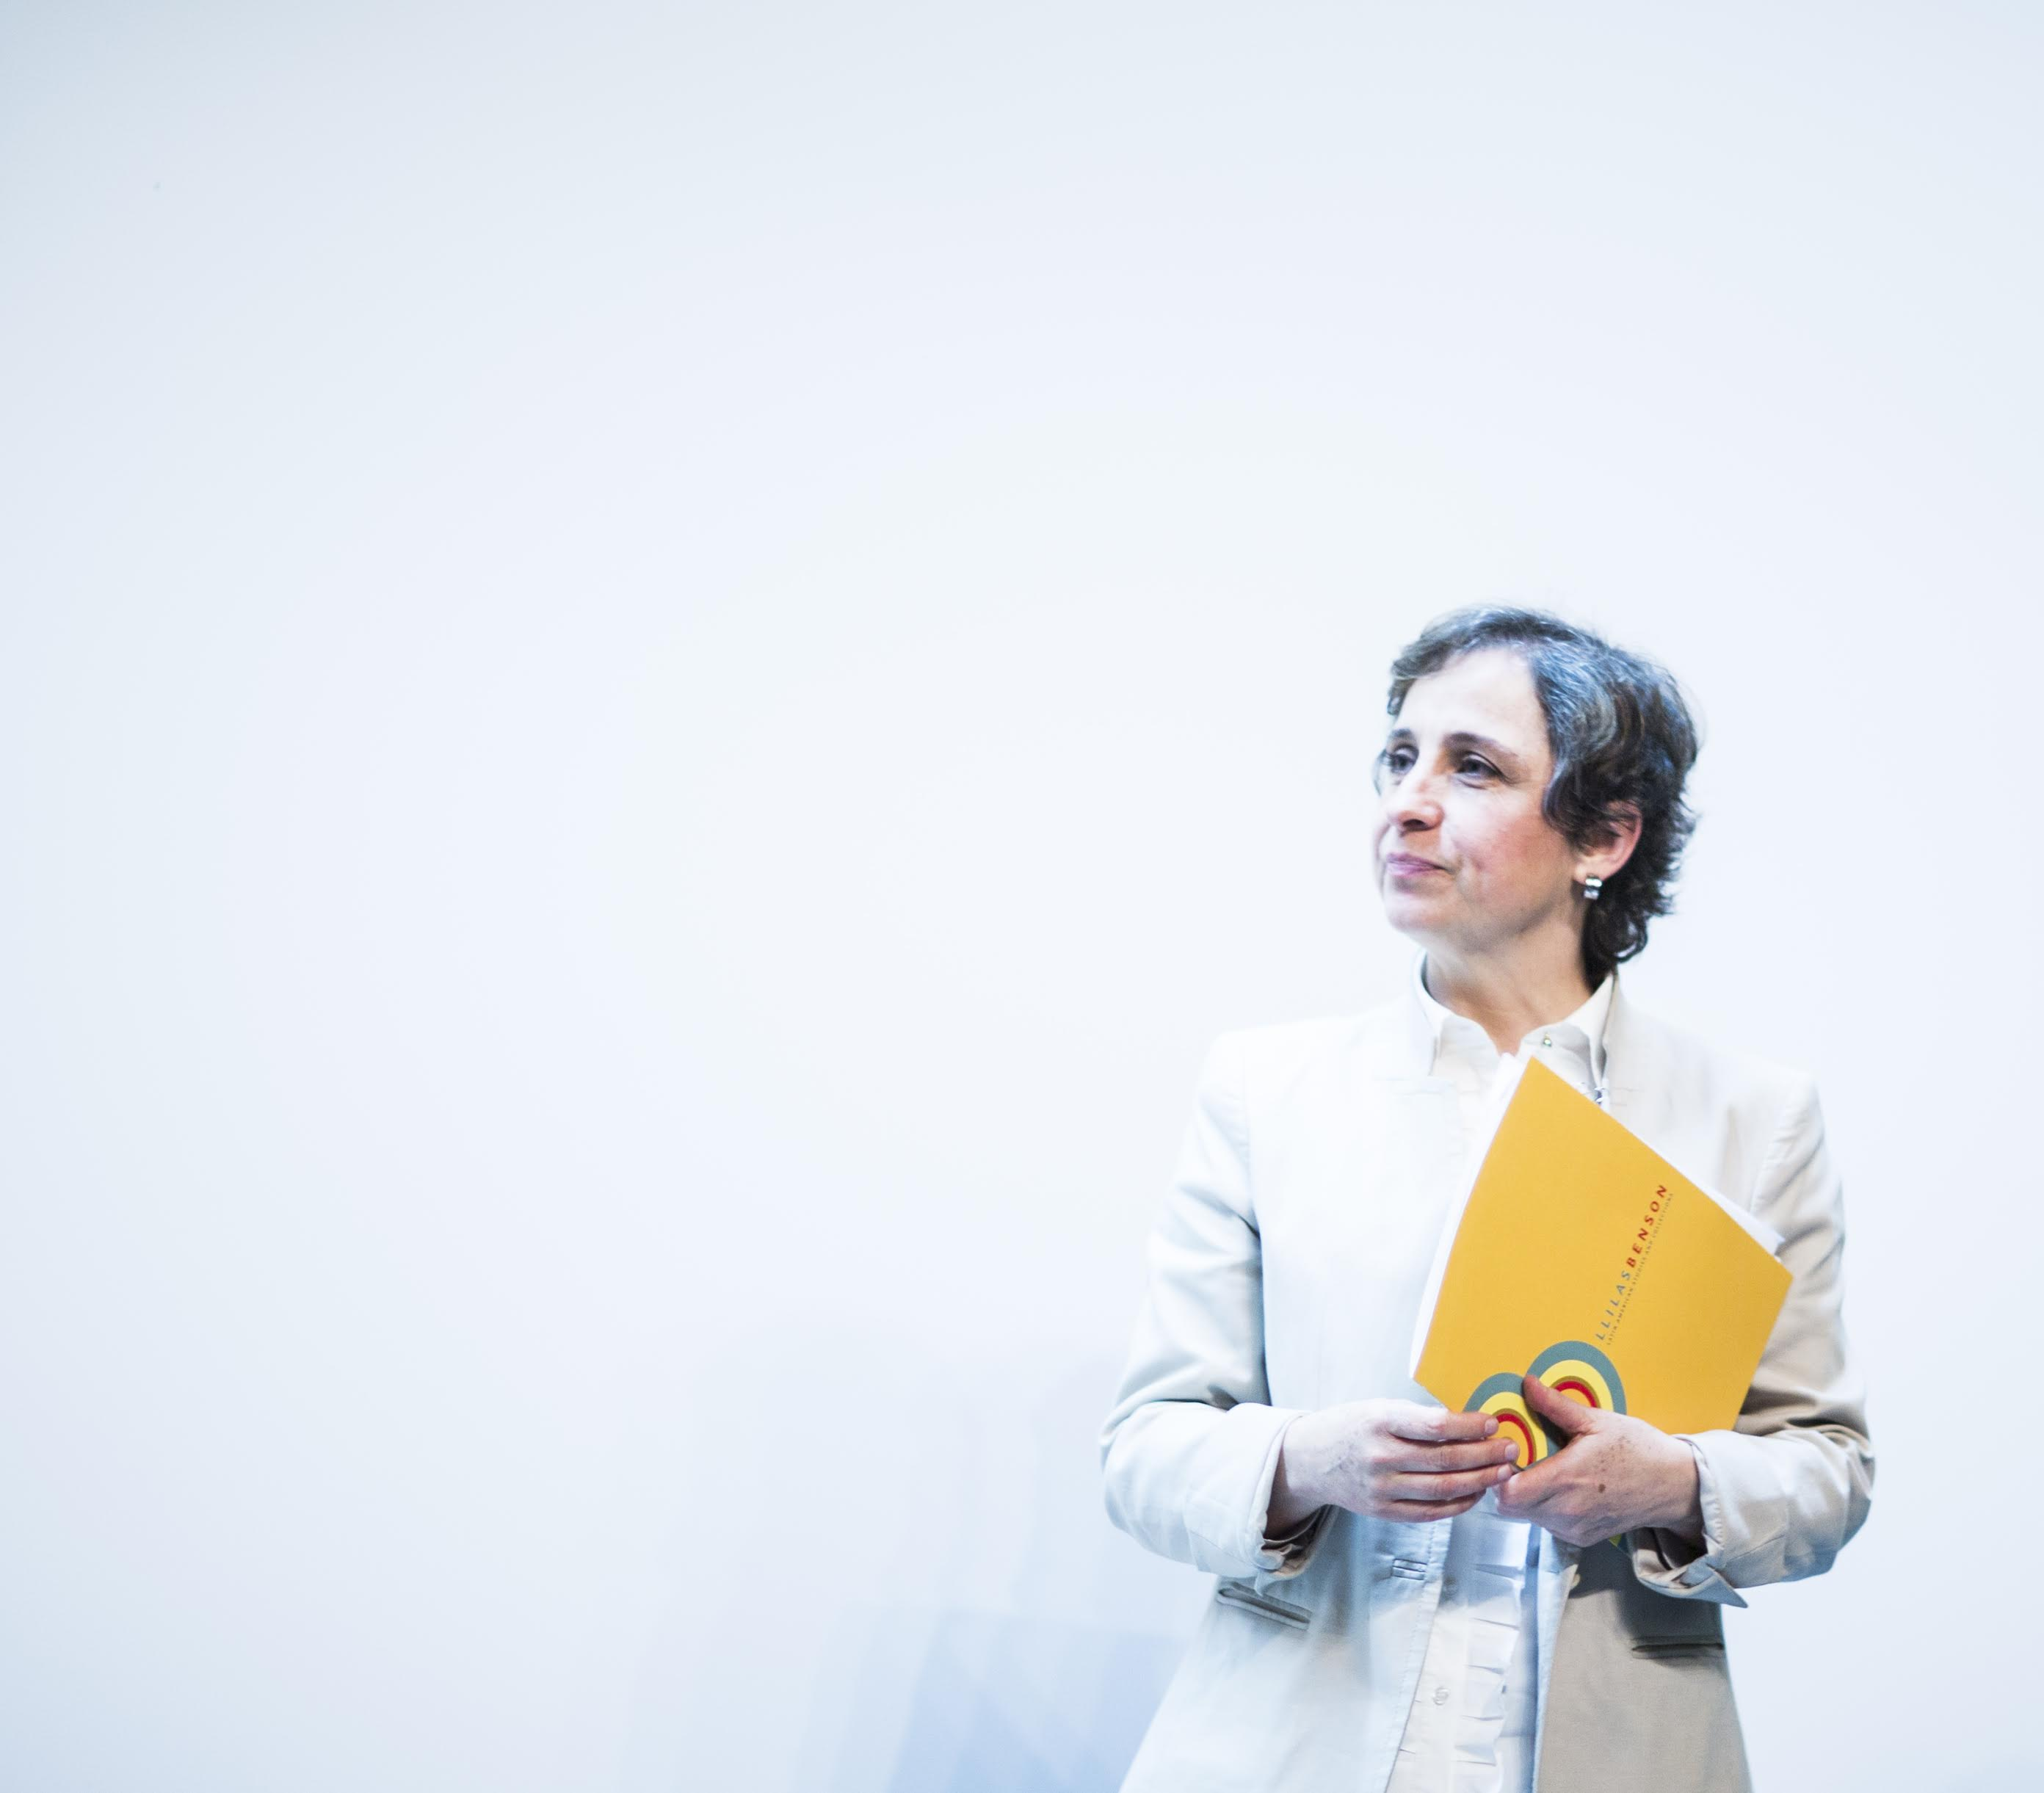 La periodista Carmen Aristegui visitóUT Austin en 2016 para dar una charla sobre la democracia en México.